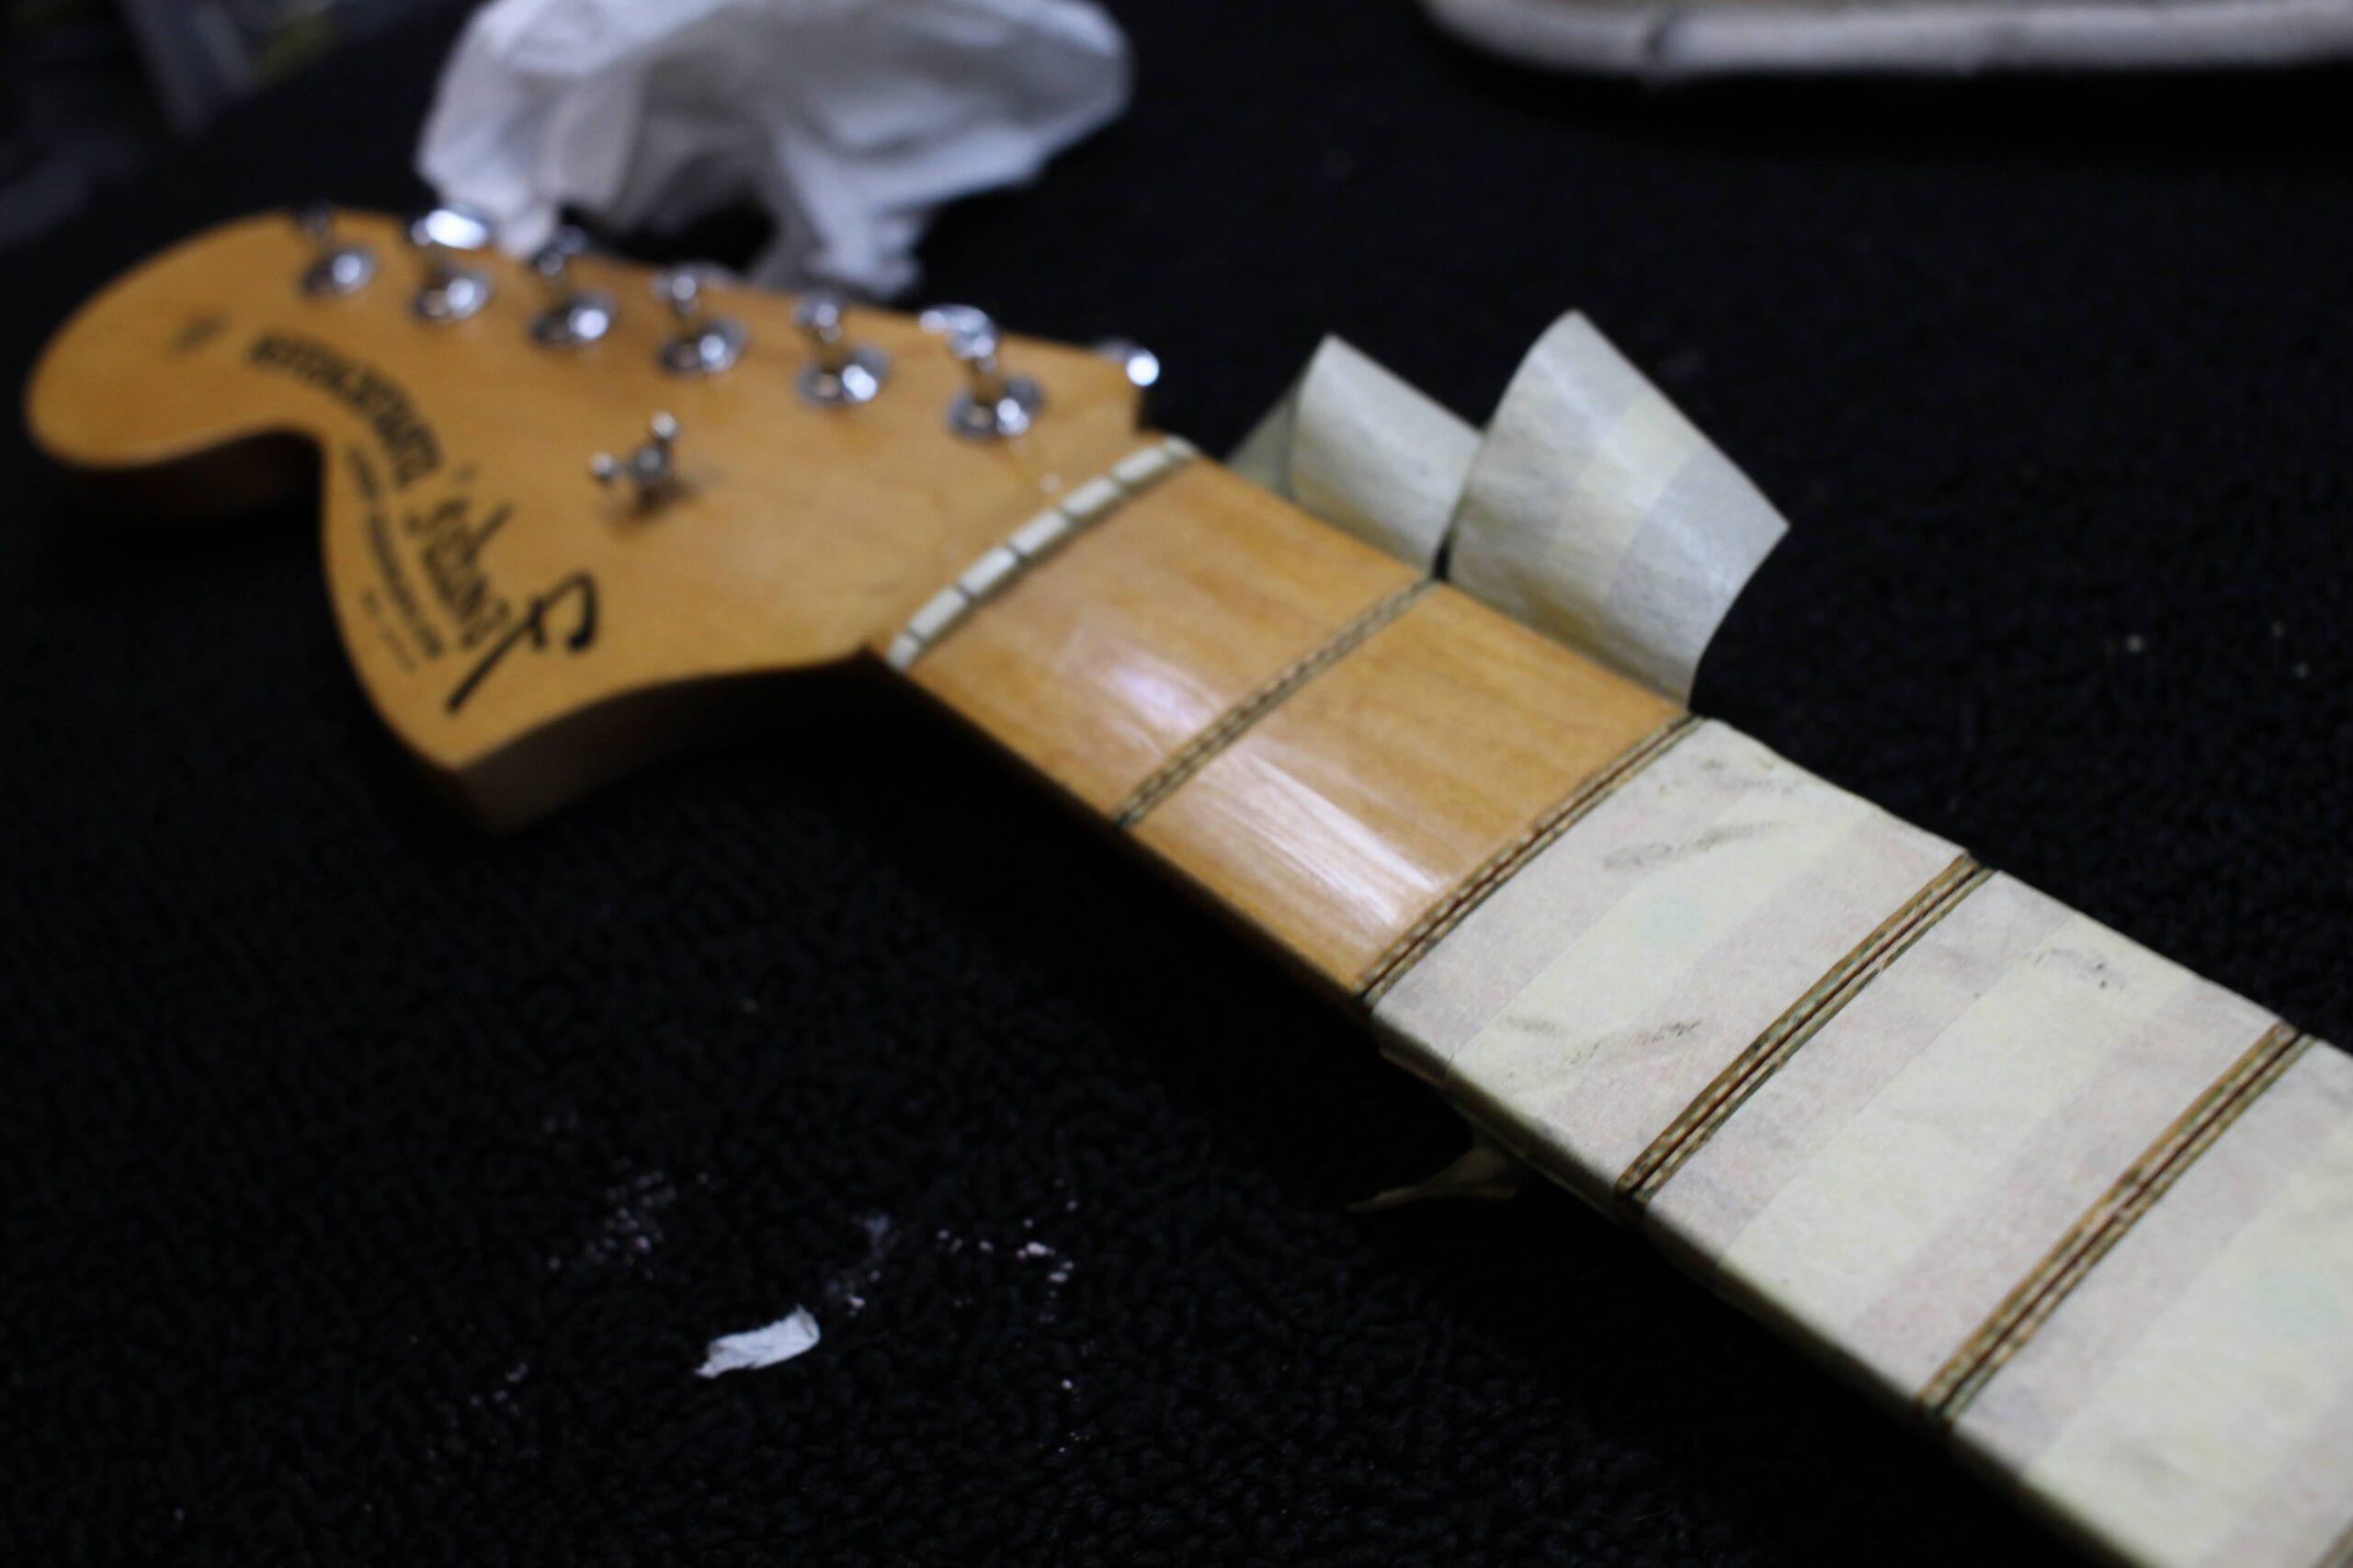 Fender Stratocaster '97 mancina, fret dressing